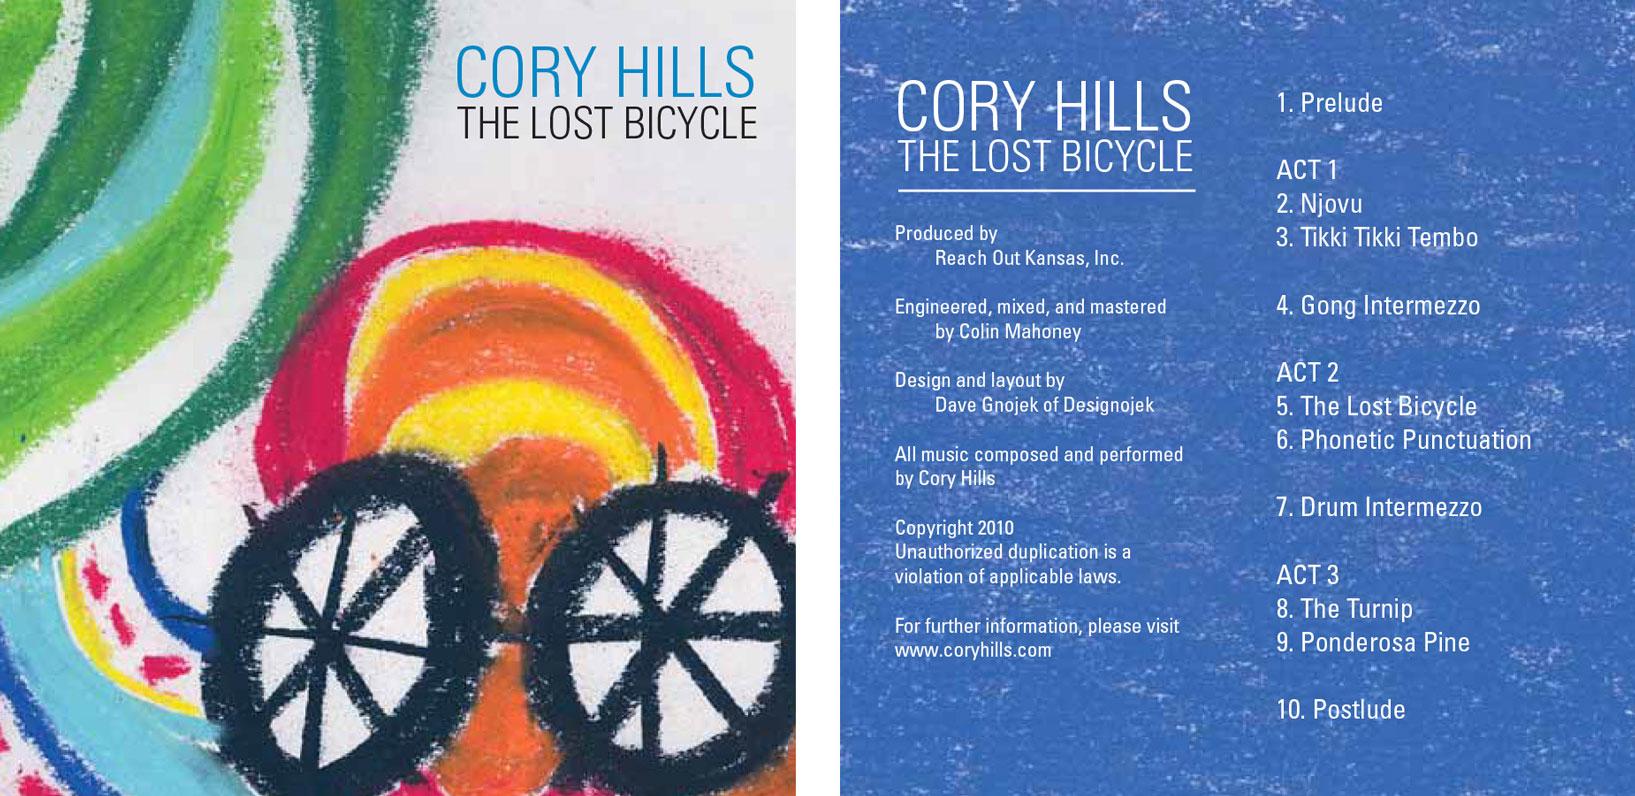 Cory Hills album cover